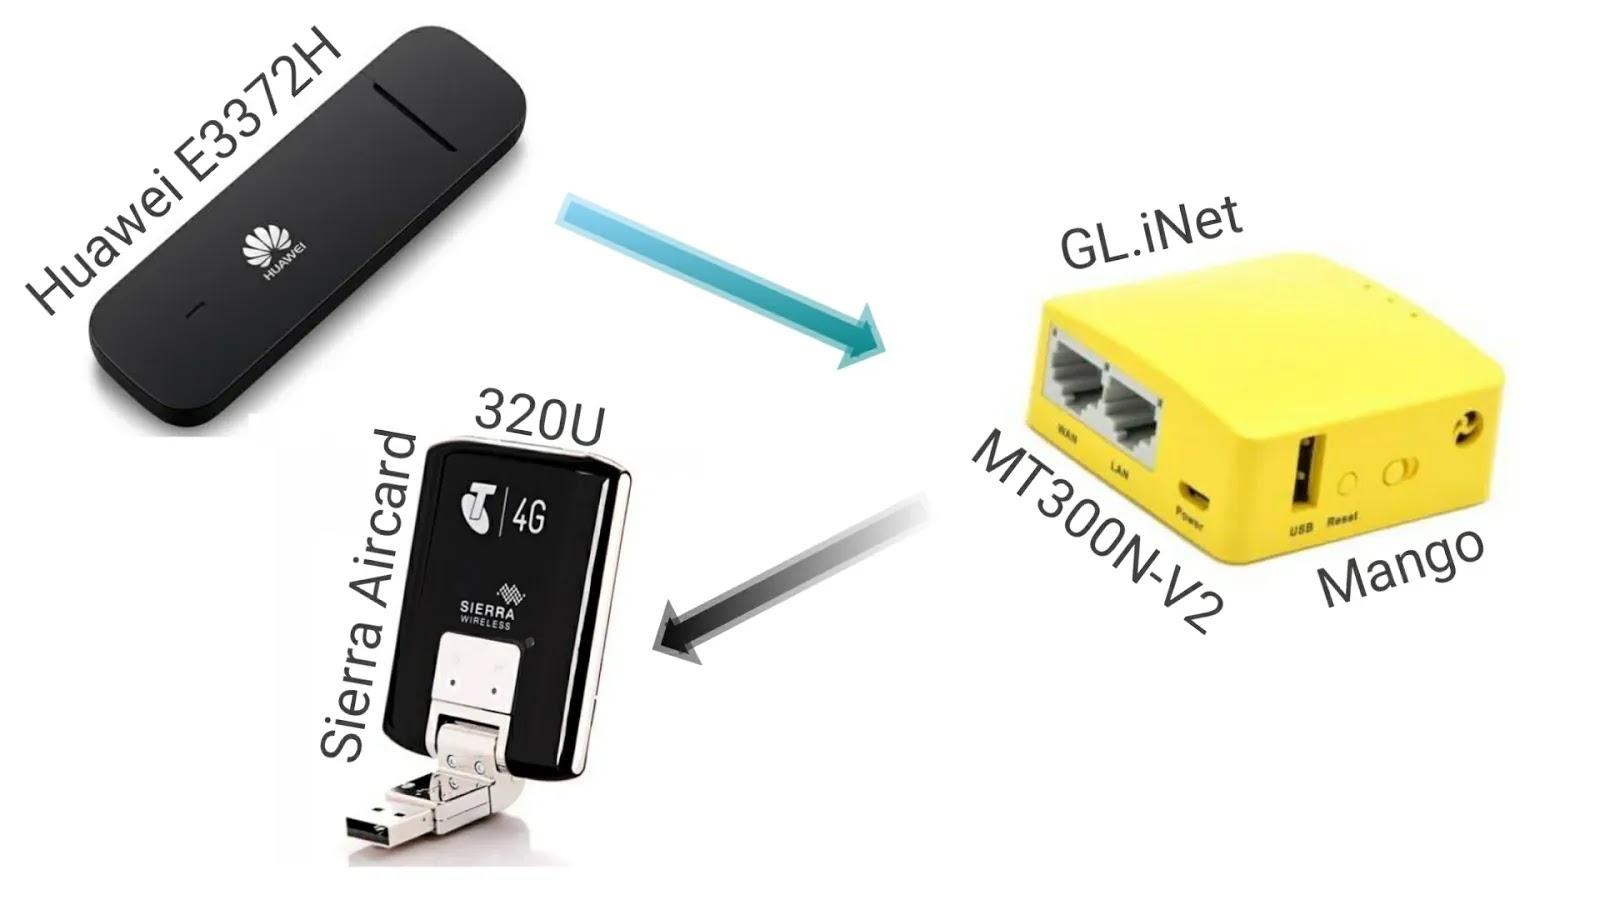 Cara Mengatasi Modem Huawei E3372H Hilink & Sierra Aircard 320U Tidak Terbaca pada Router GL.iNet MT300N-V2 Mango